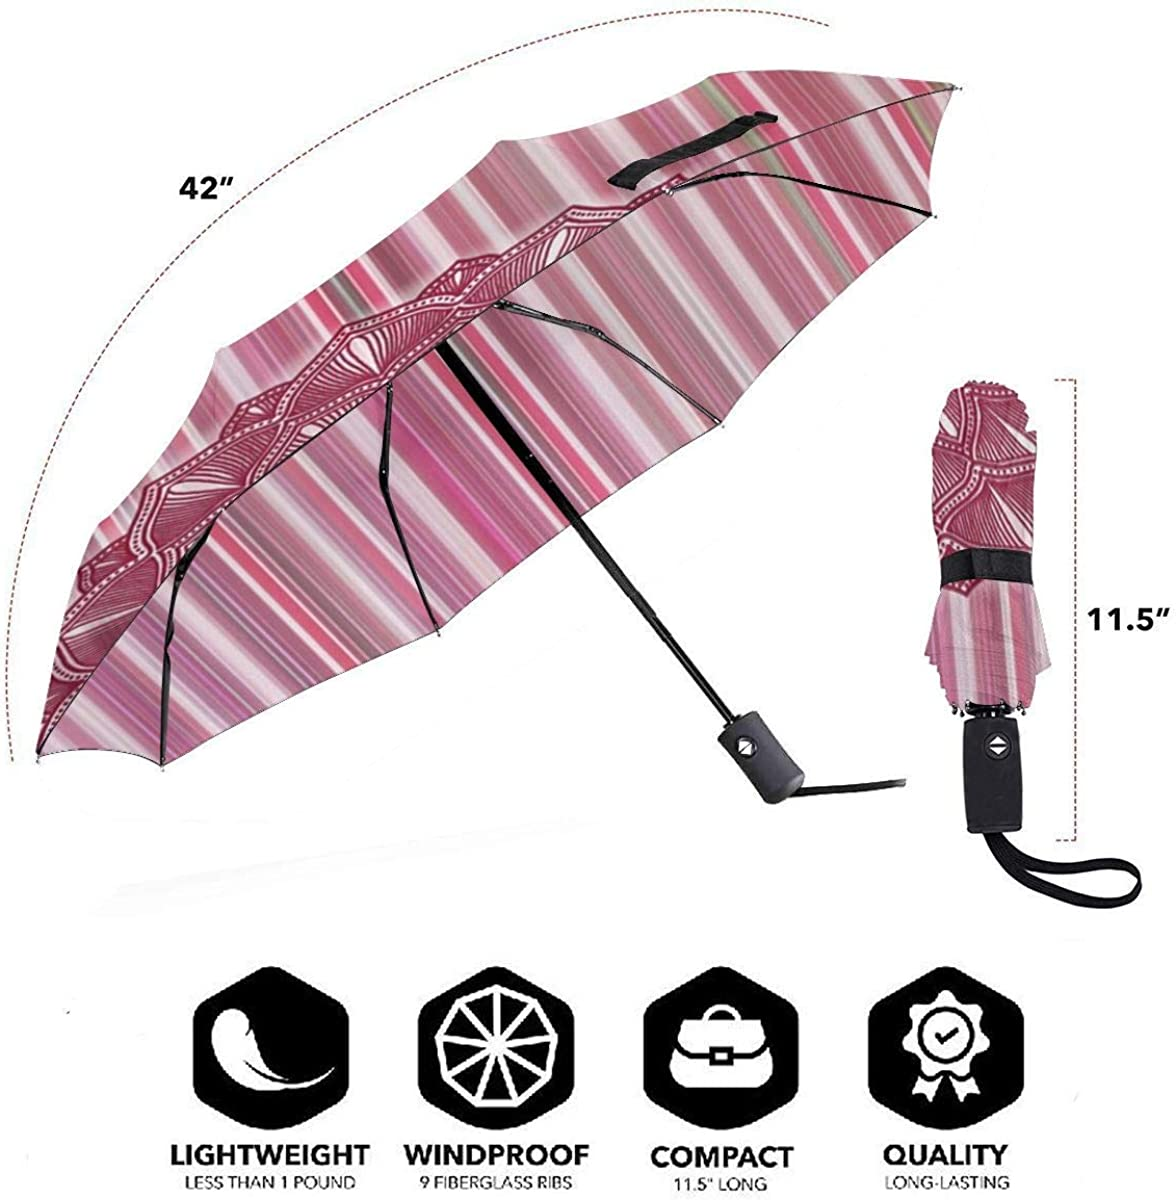 Mandala Vintage Scrapbook Pink Compact Travel Umbrella Windproof Reinforced Canopy 8 Ribs Umbrella Auto Open And Close Button Customized